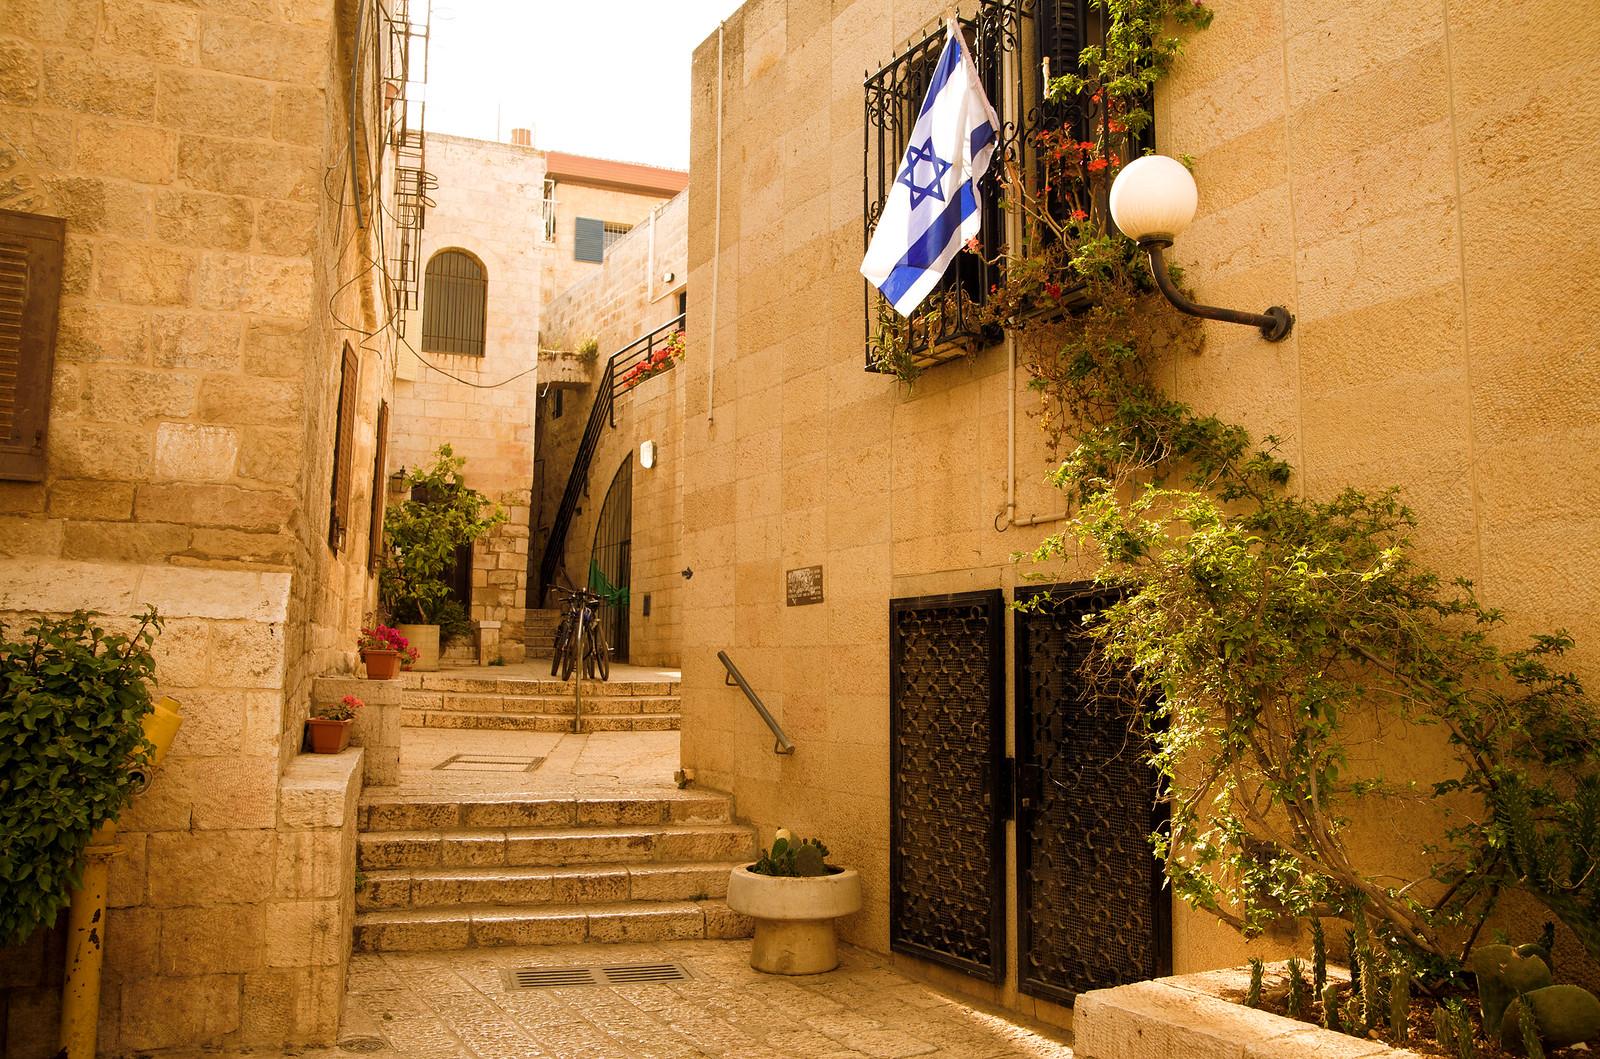 Jerusalem_Old City_Jewish Quater_6_Noam Chen_IMOT